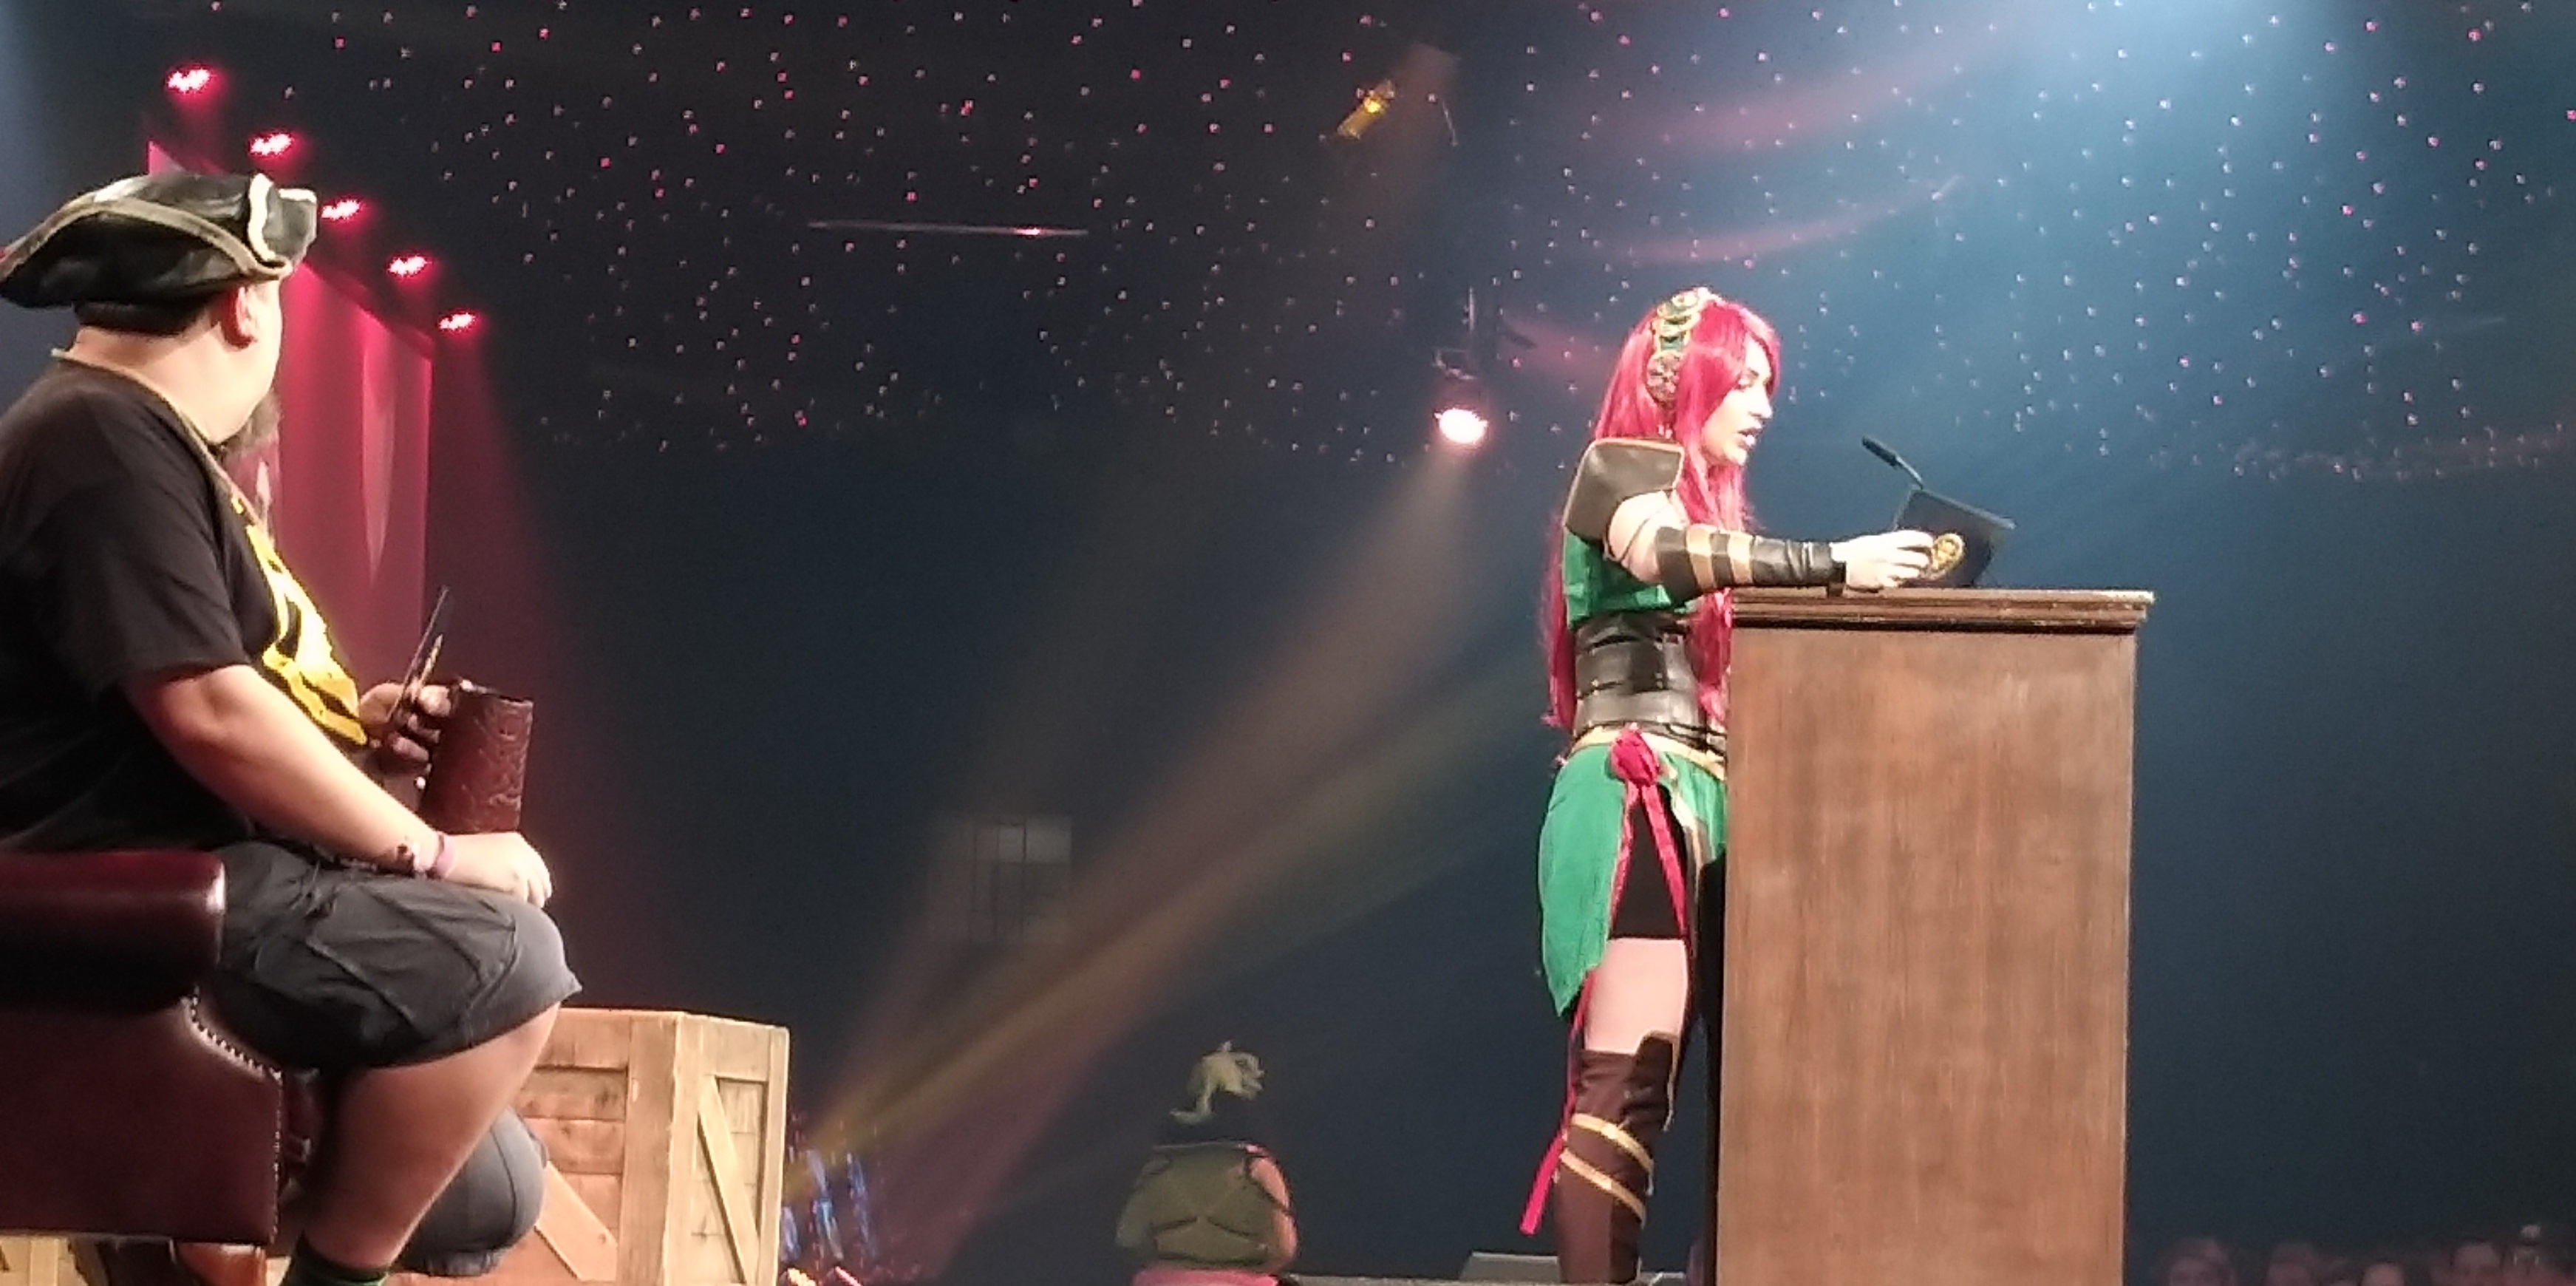 RuneFest - Cosplay